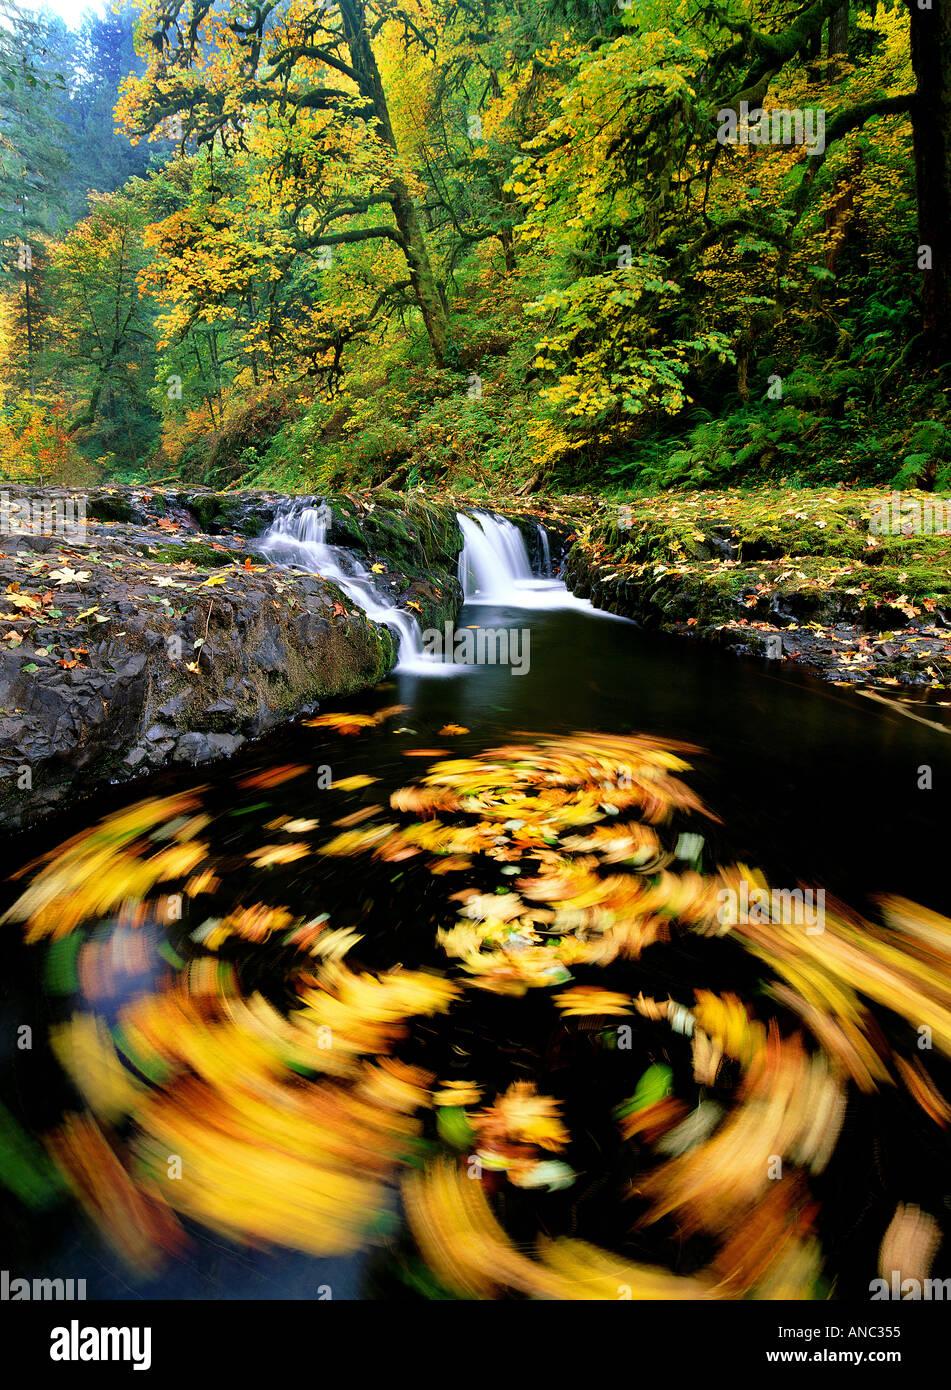 M00182M Tiff Herbst farbige Big Leaf Maple Blätter wirbeln in North Fork Silver Creek Silver Falls State Park-Oregon Stockbild